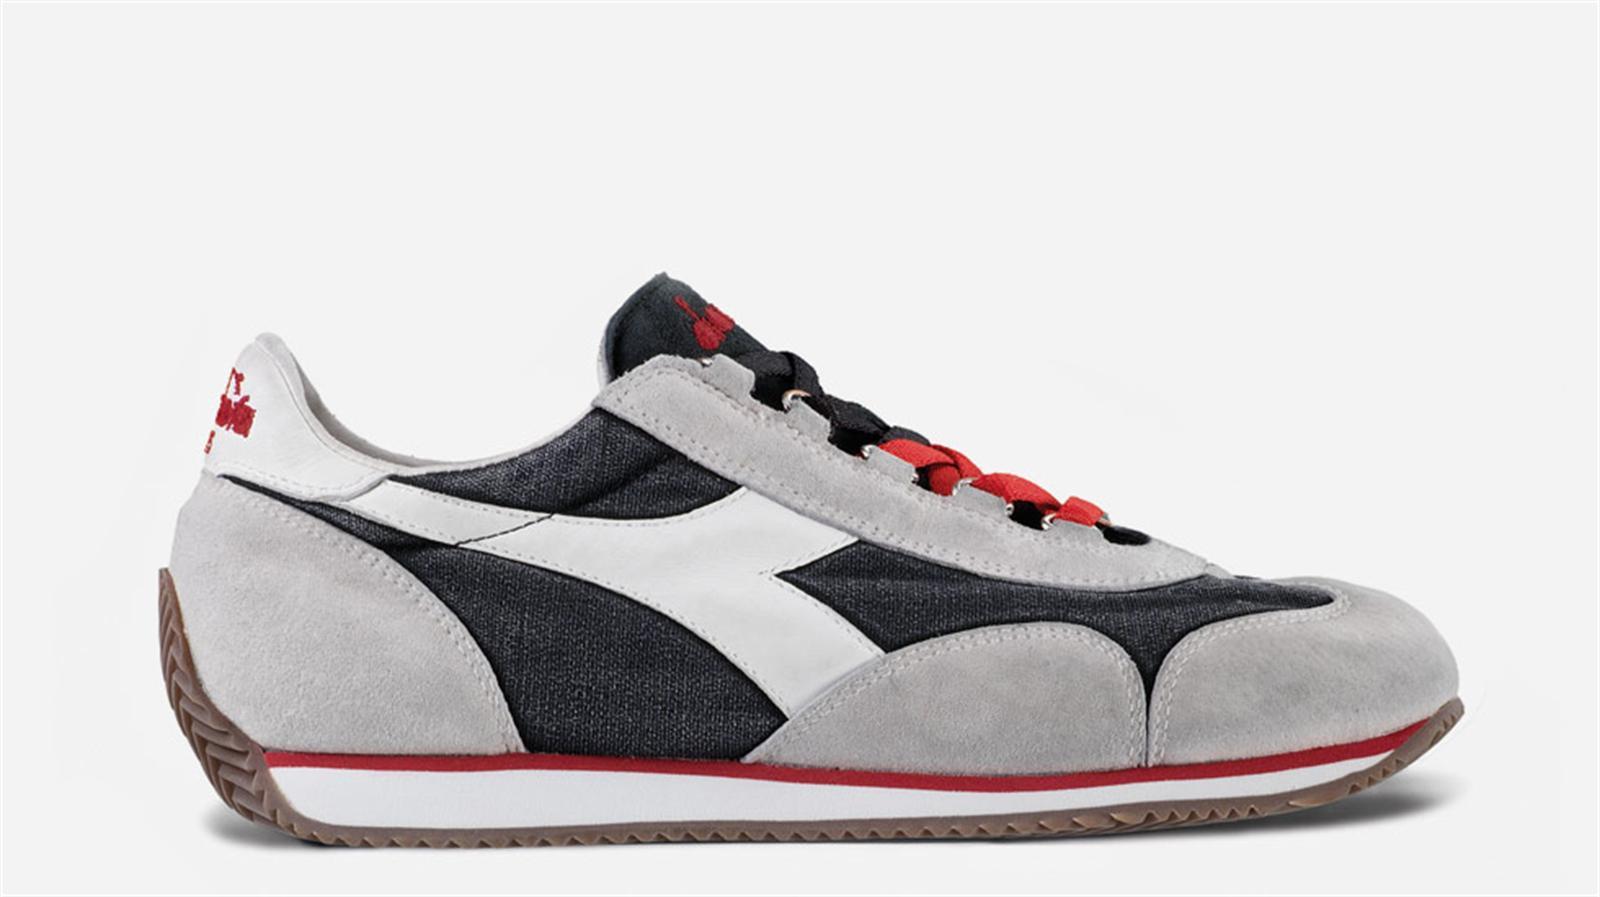 Acquistare scarpa diadora heritage Economici> OFF56% scontate